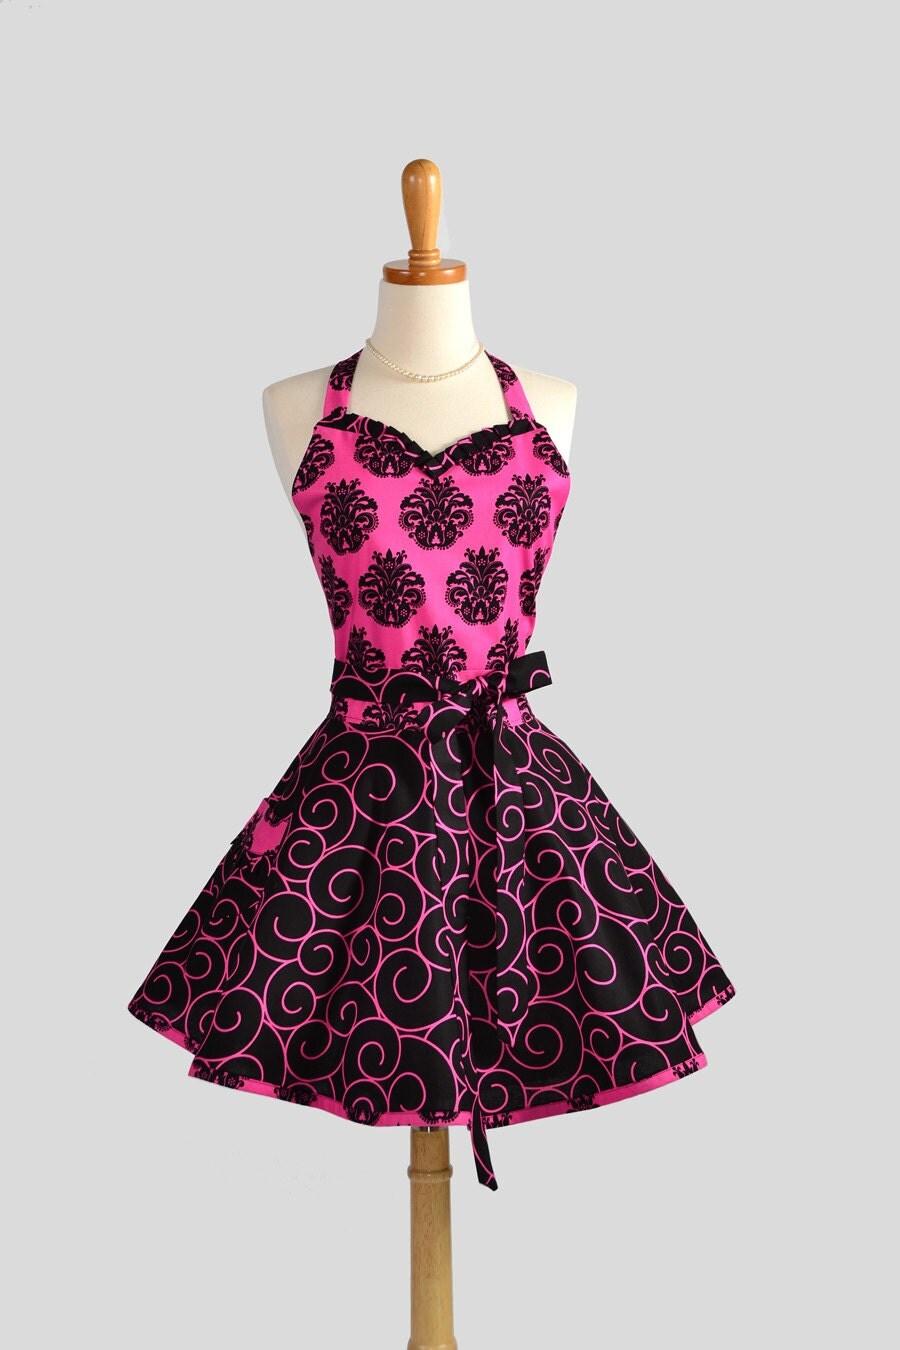 sweetheart retro apron sexy womens apron in fucshia and. Black Bedroom Furniture Sets. Home Design Ideas